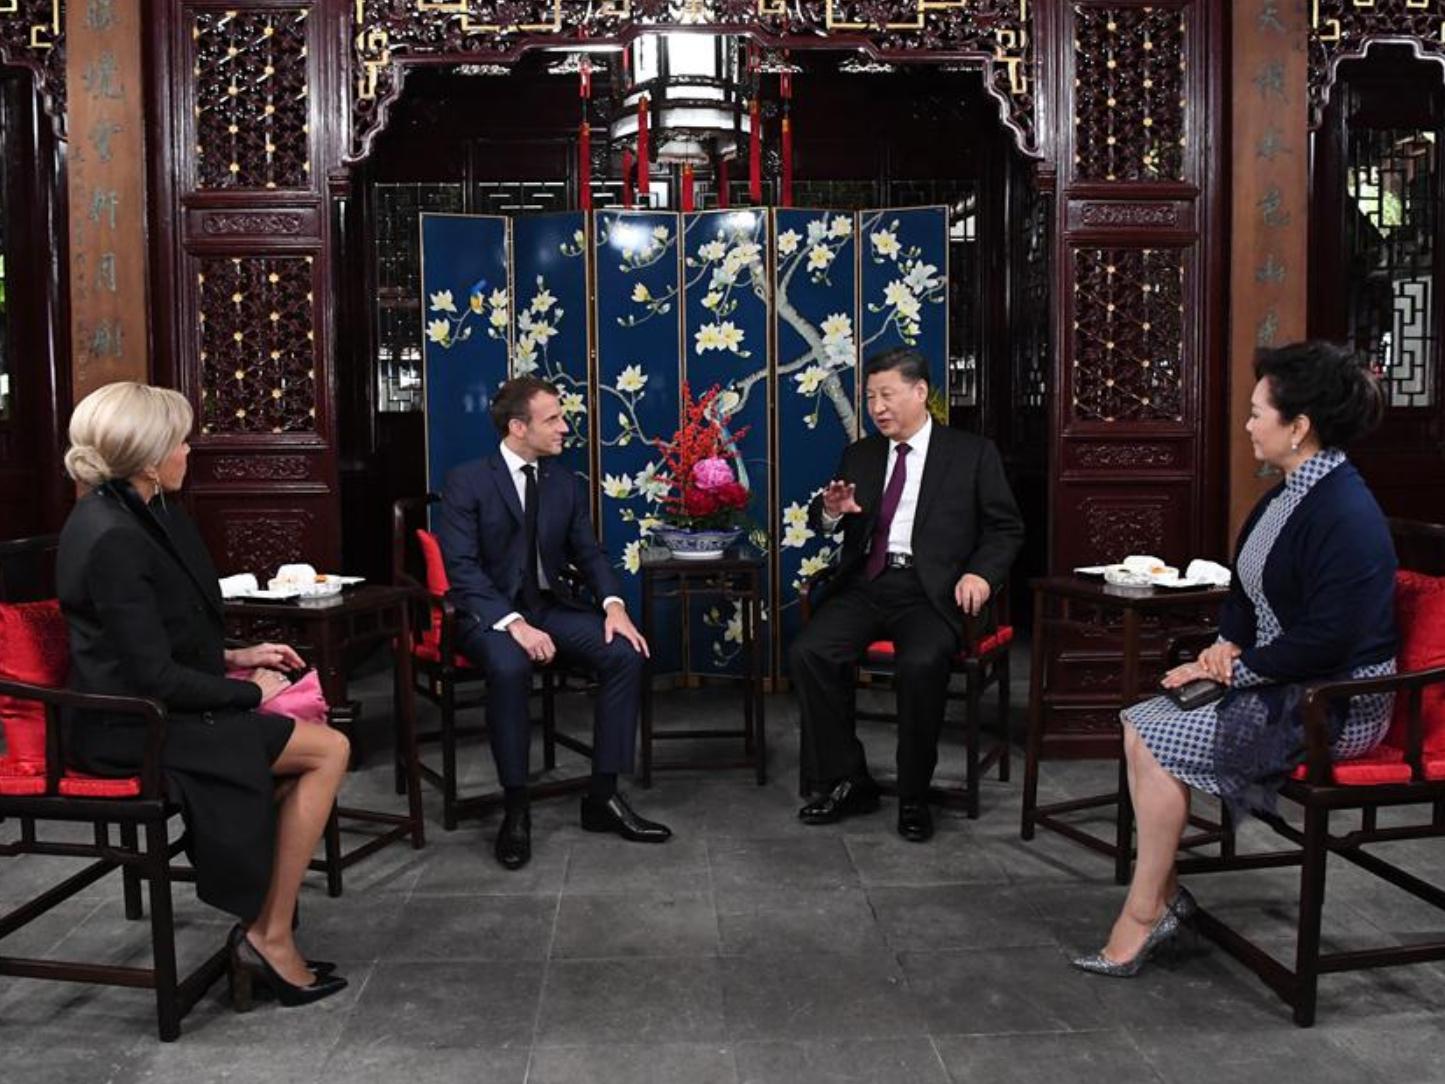 China, France should shoulder more responsibilities: Xi